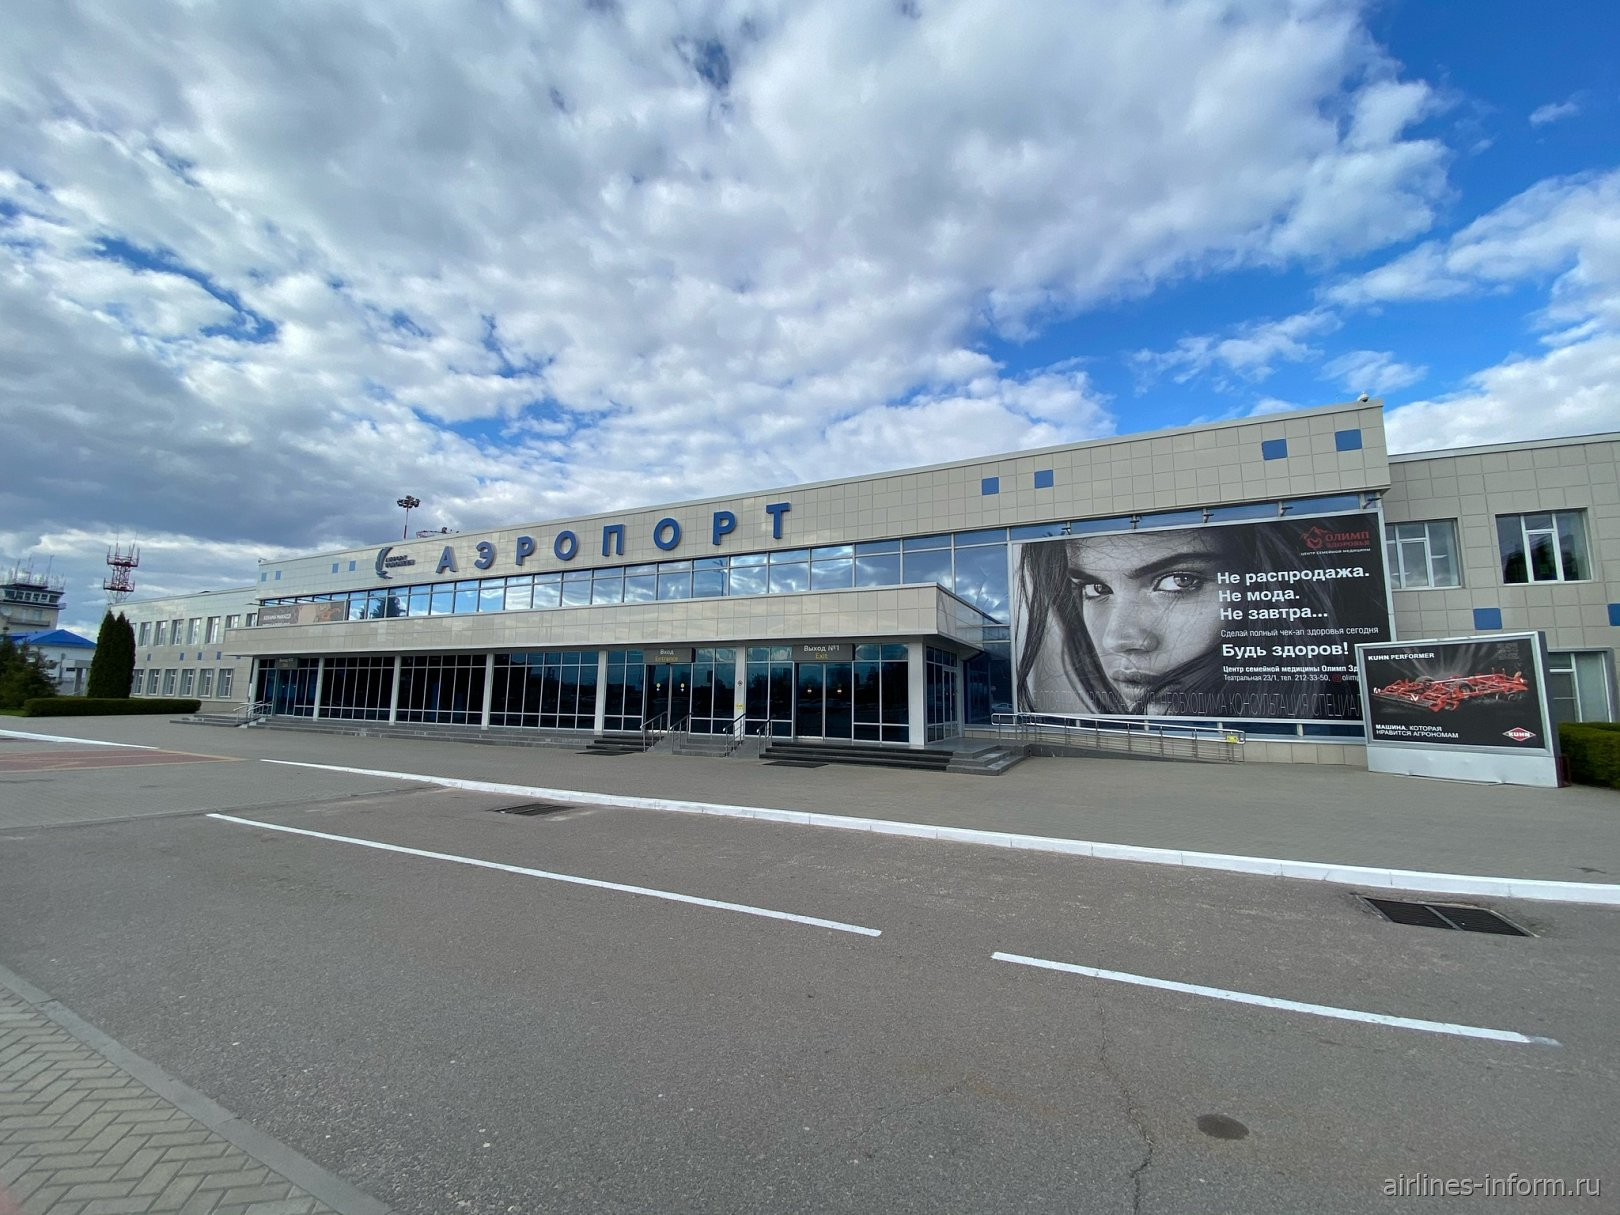 Пассажирский терминал аэропорта Воронеж